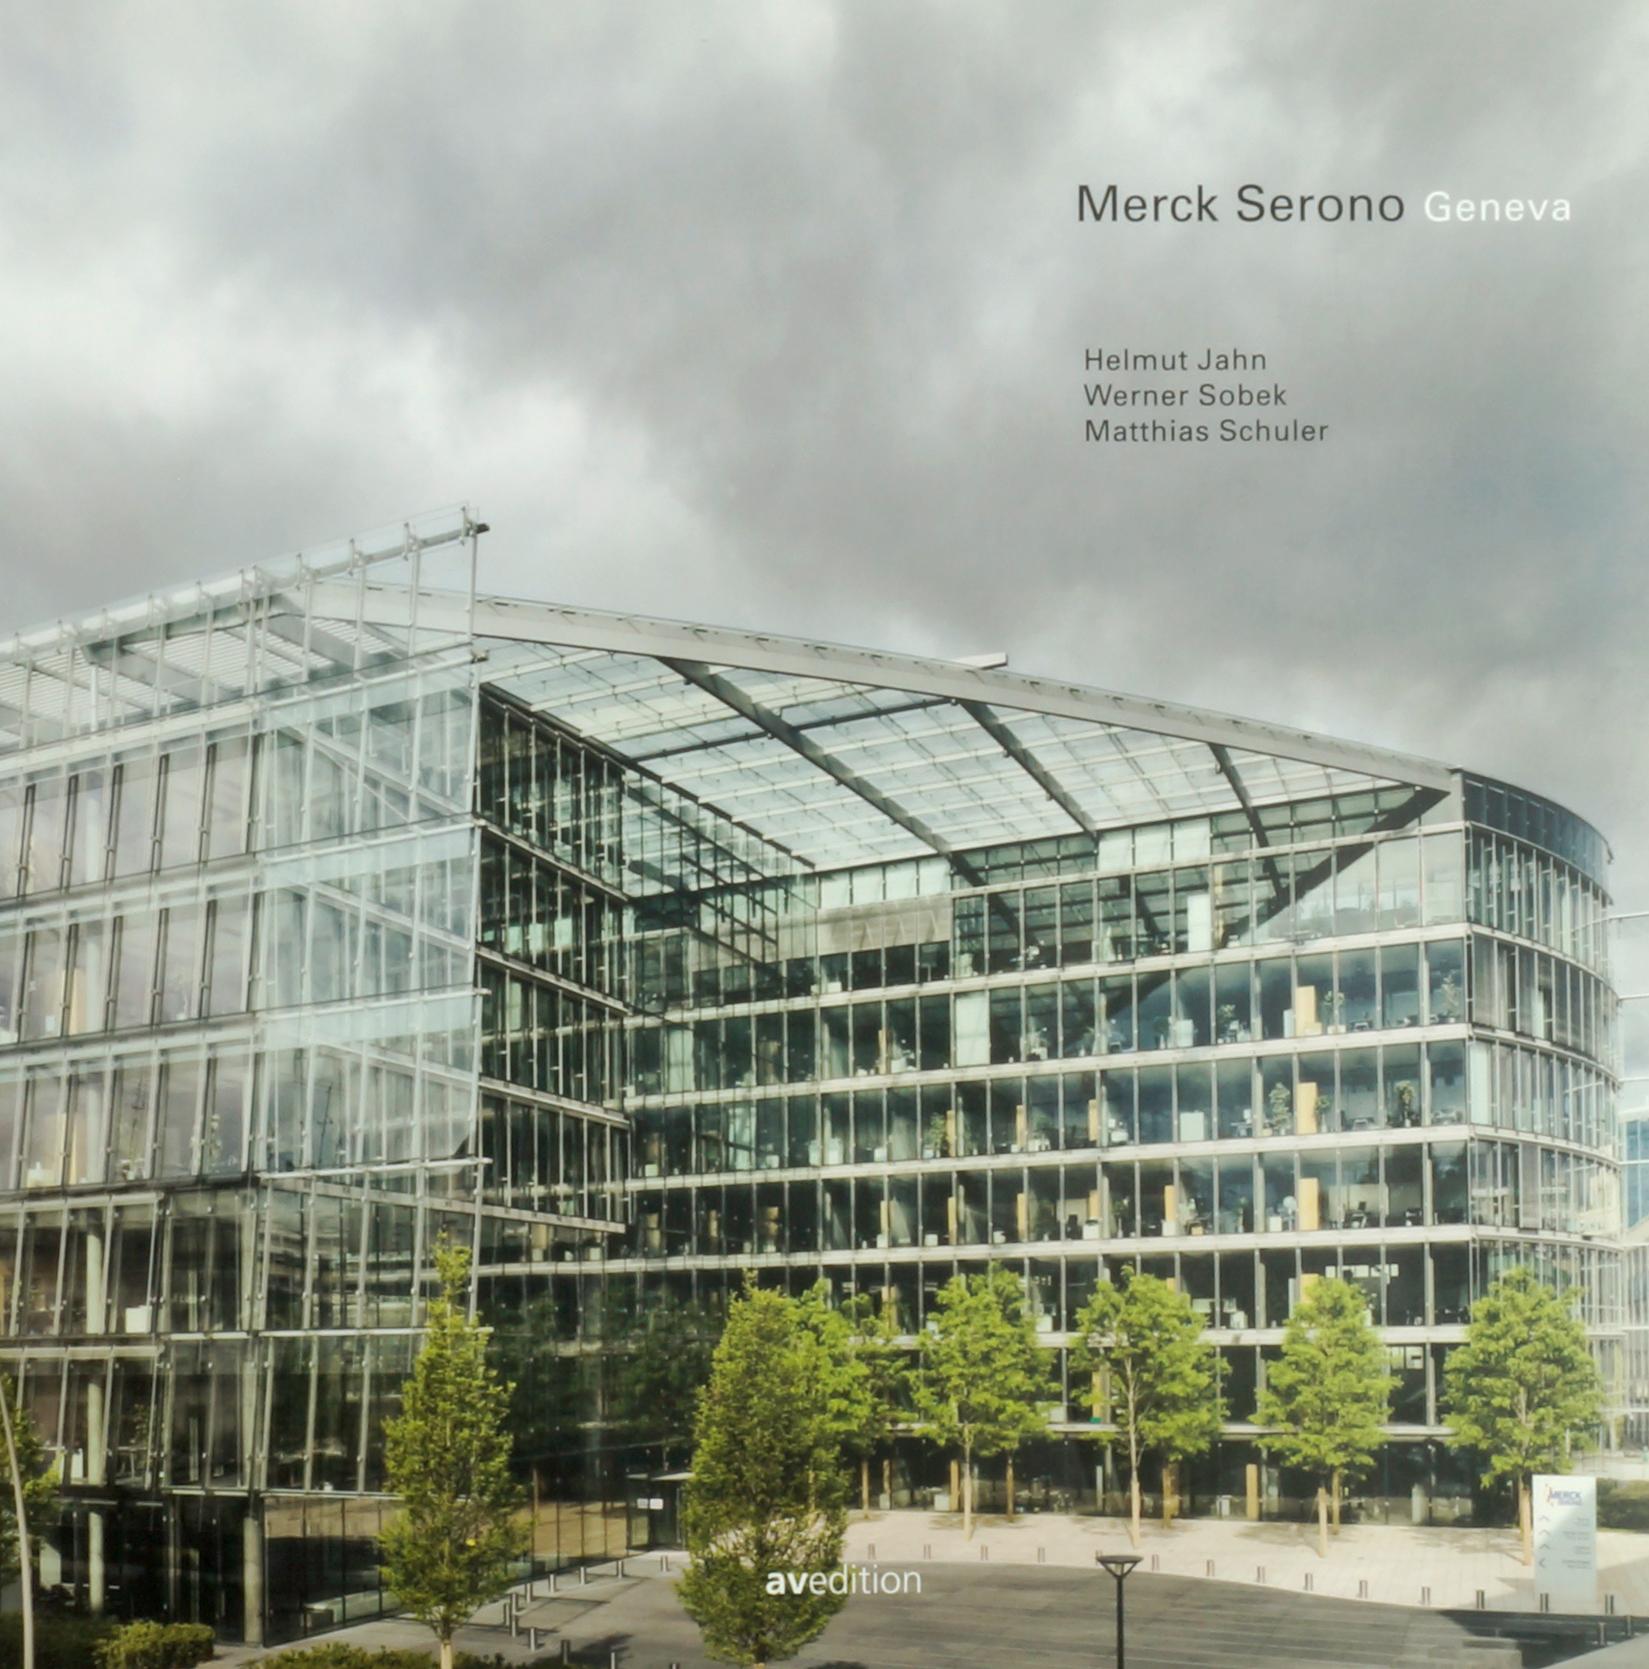 Merck Serono, Geneva